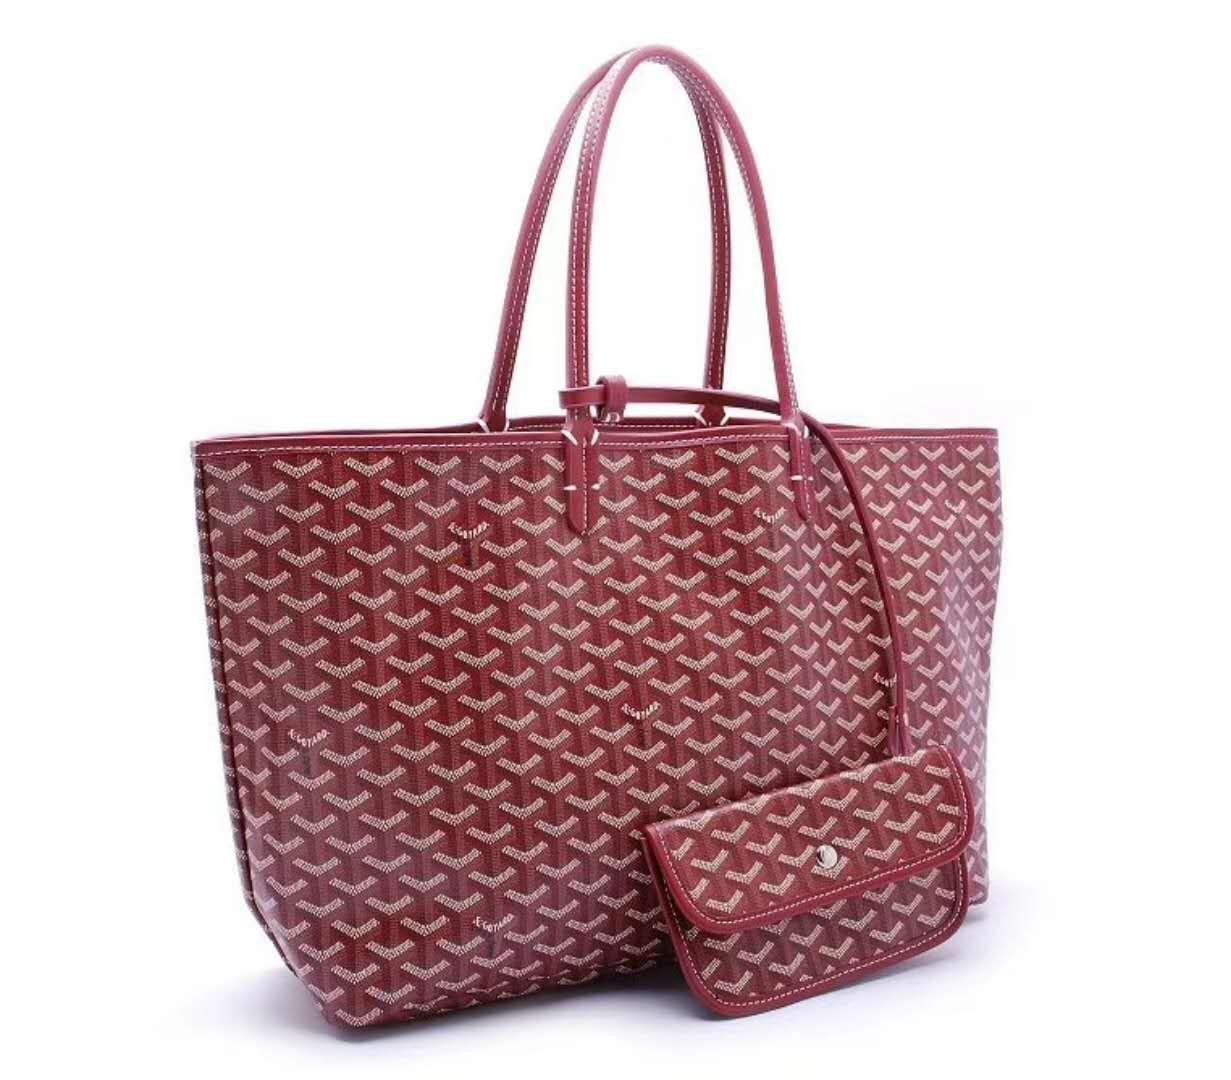 a49f7848cd47e Großhandel Pink Sugao Top Echtes Leder Handtasche Frauen ...